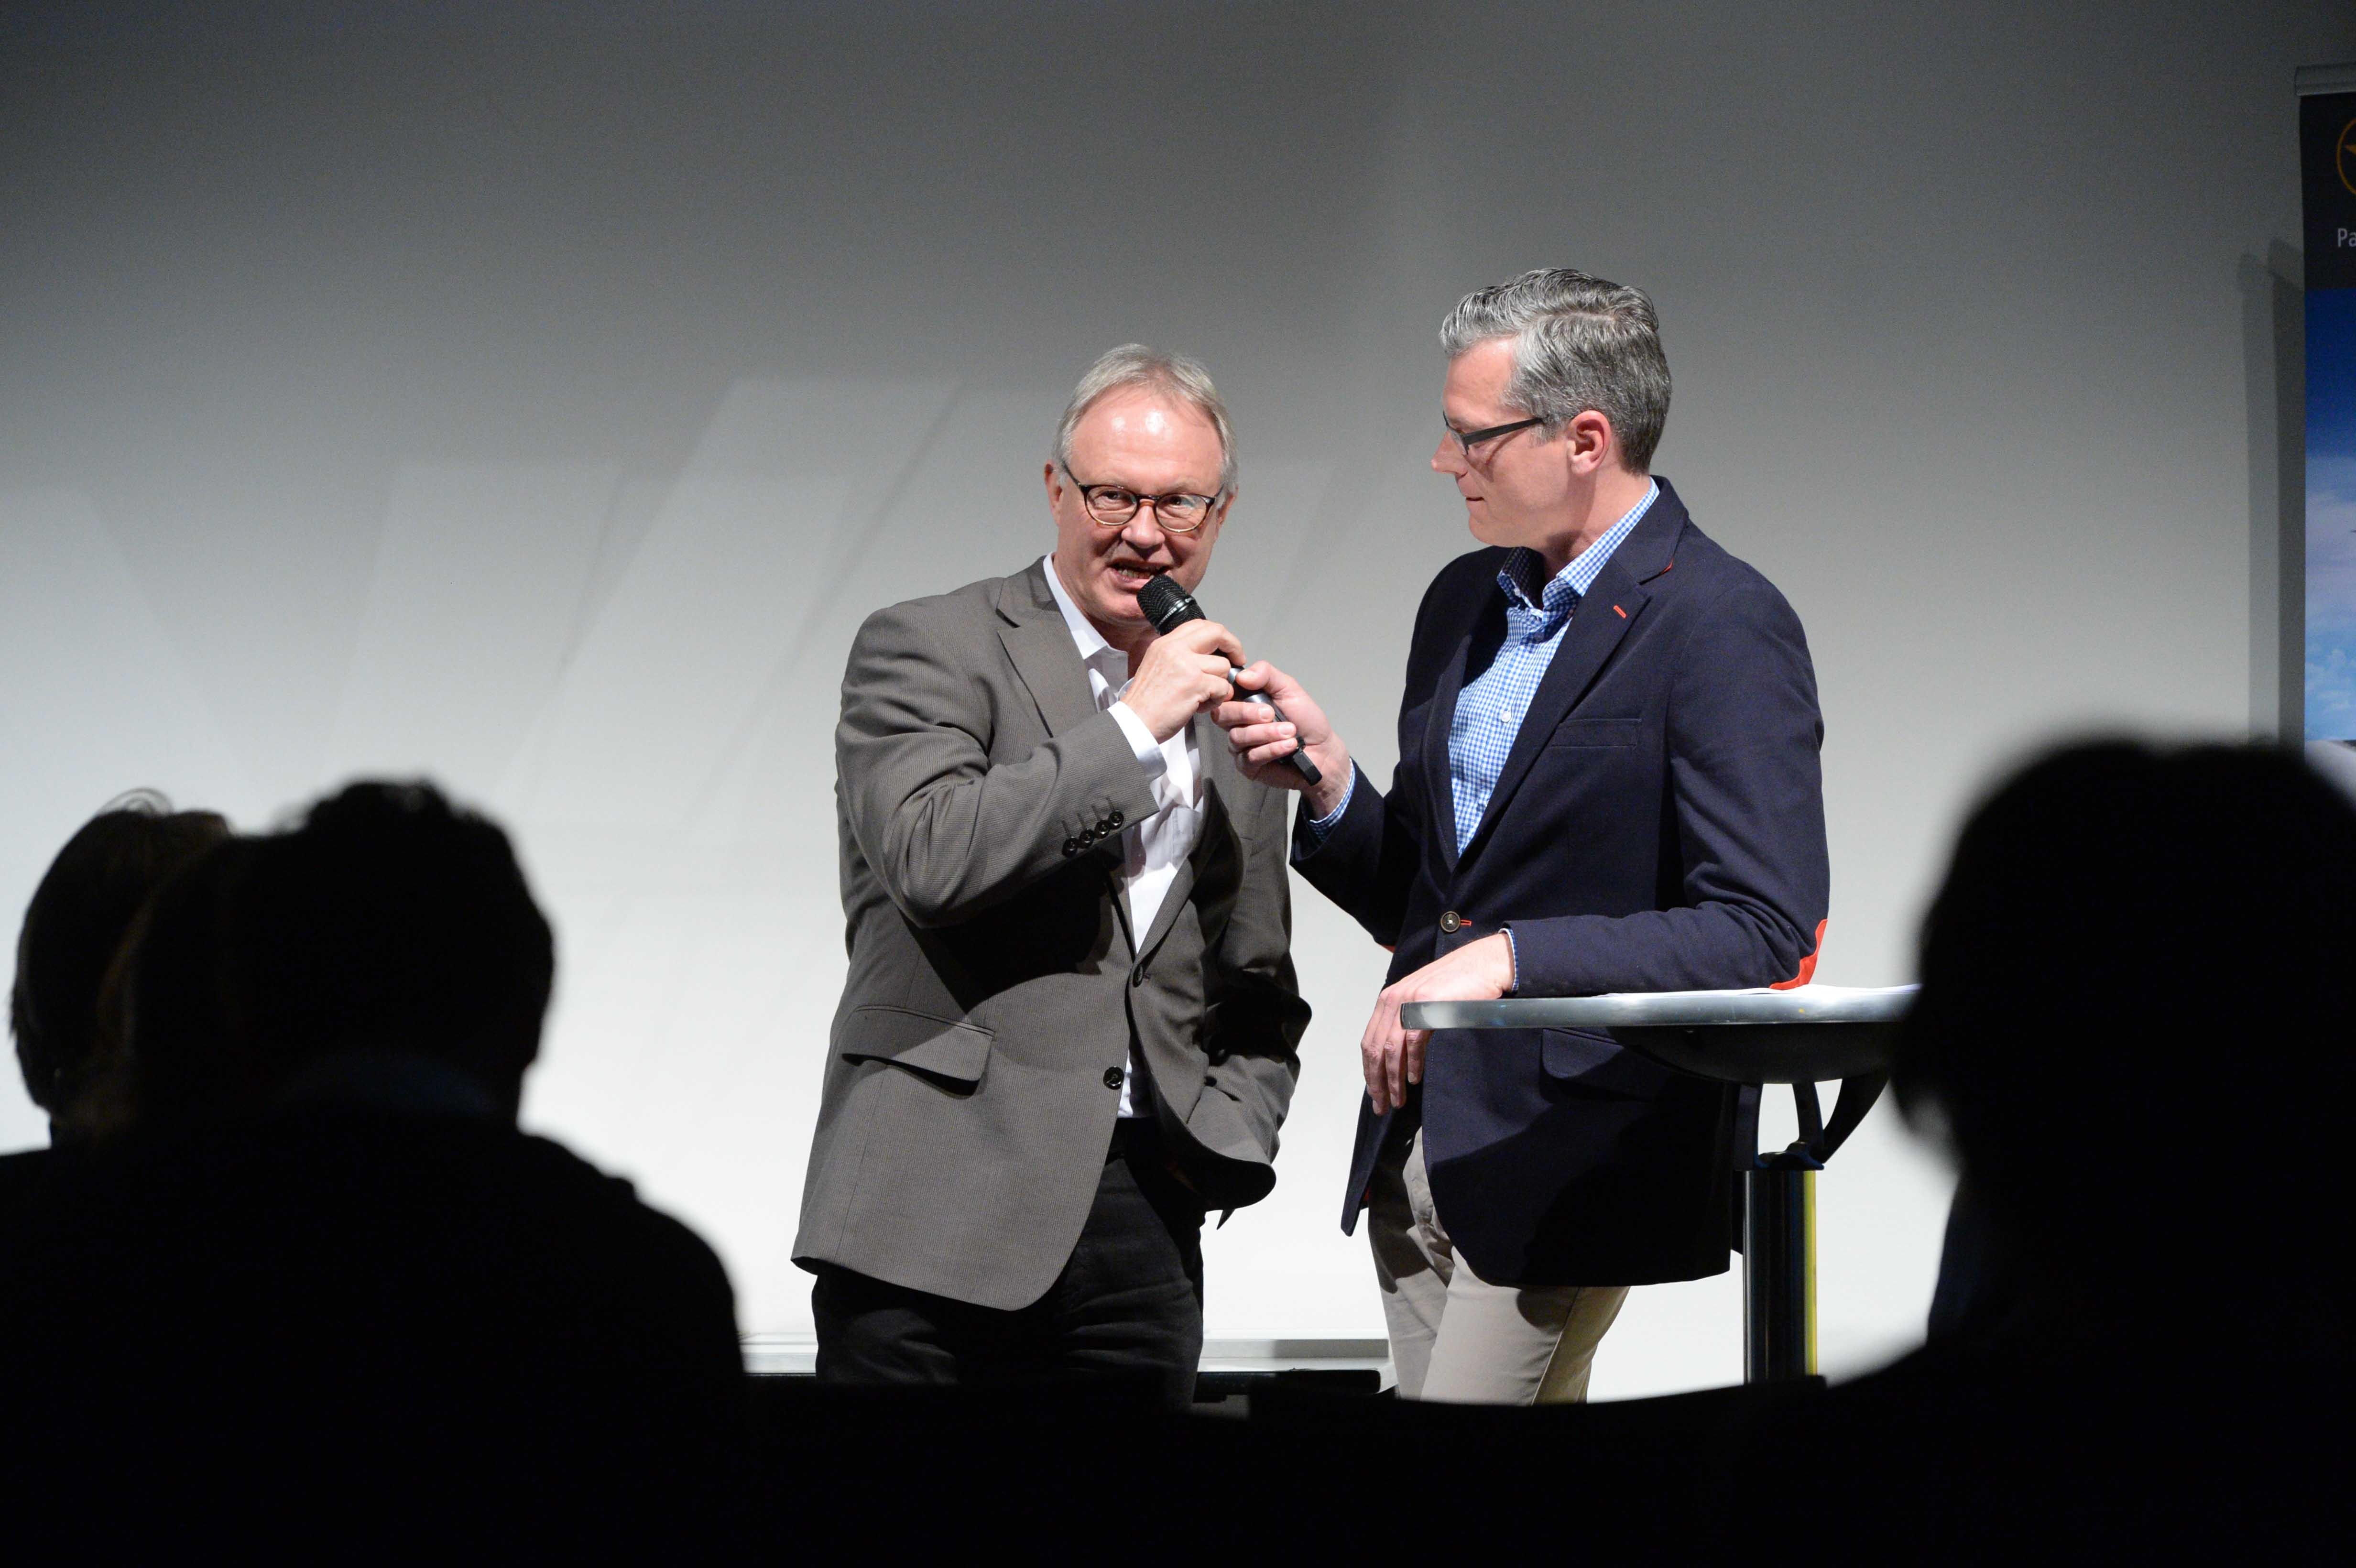 Columbus Radio Preisverleihung 2015 Wolfgang Heinemann NDR Talk mit Holger Wetzel